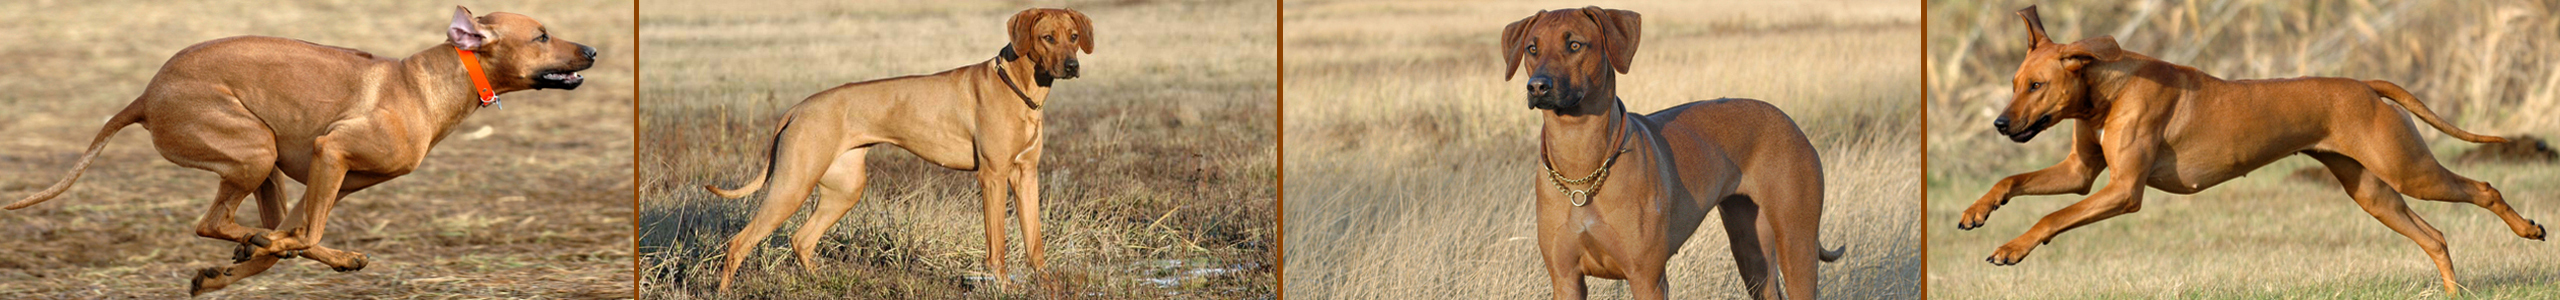 Caladesi Rhodesian Ridgeback